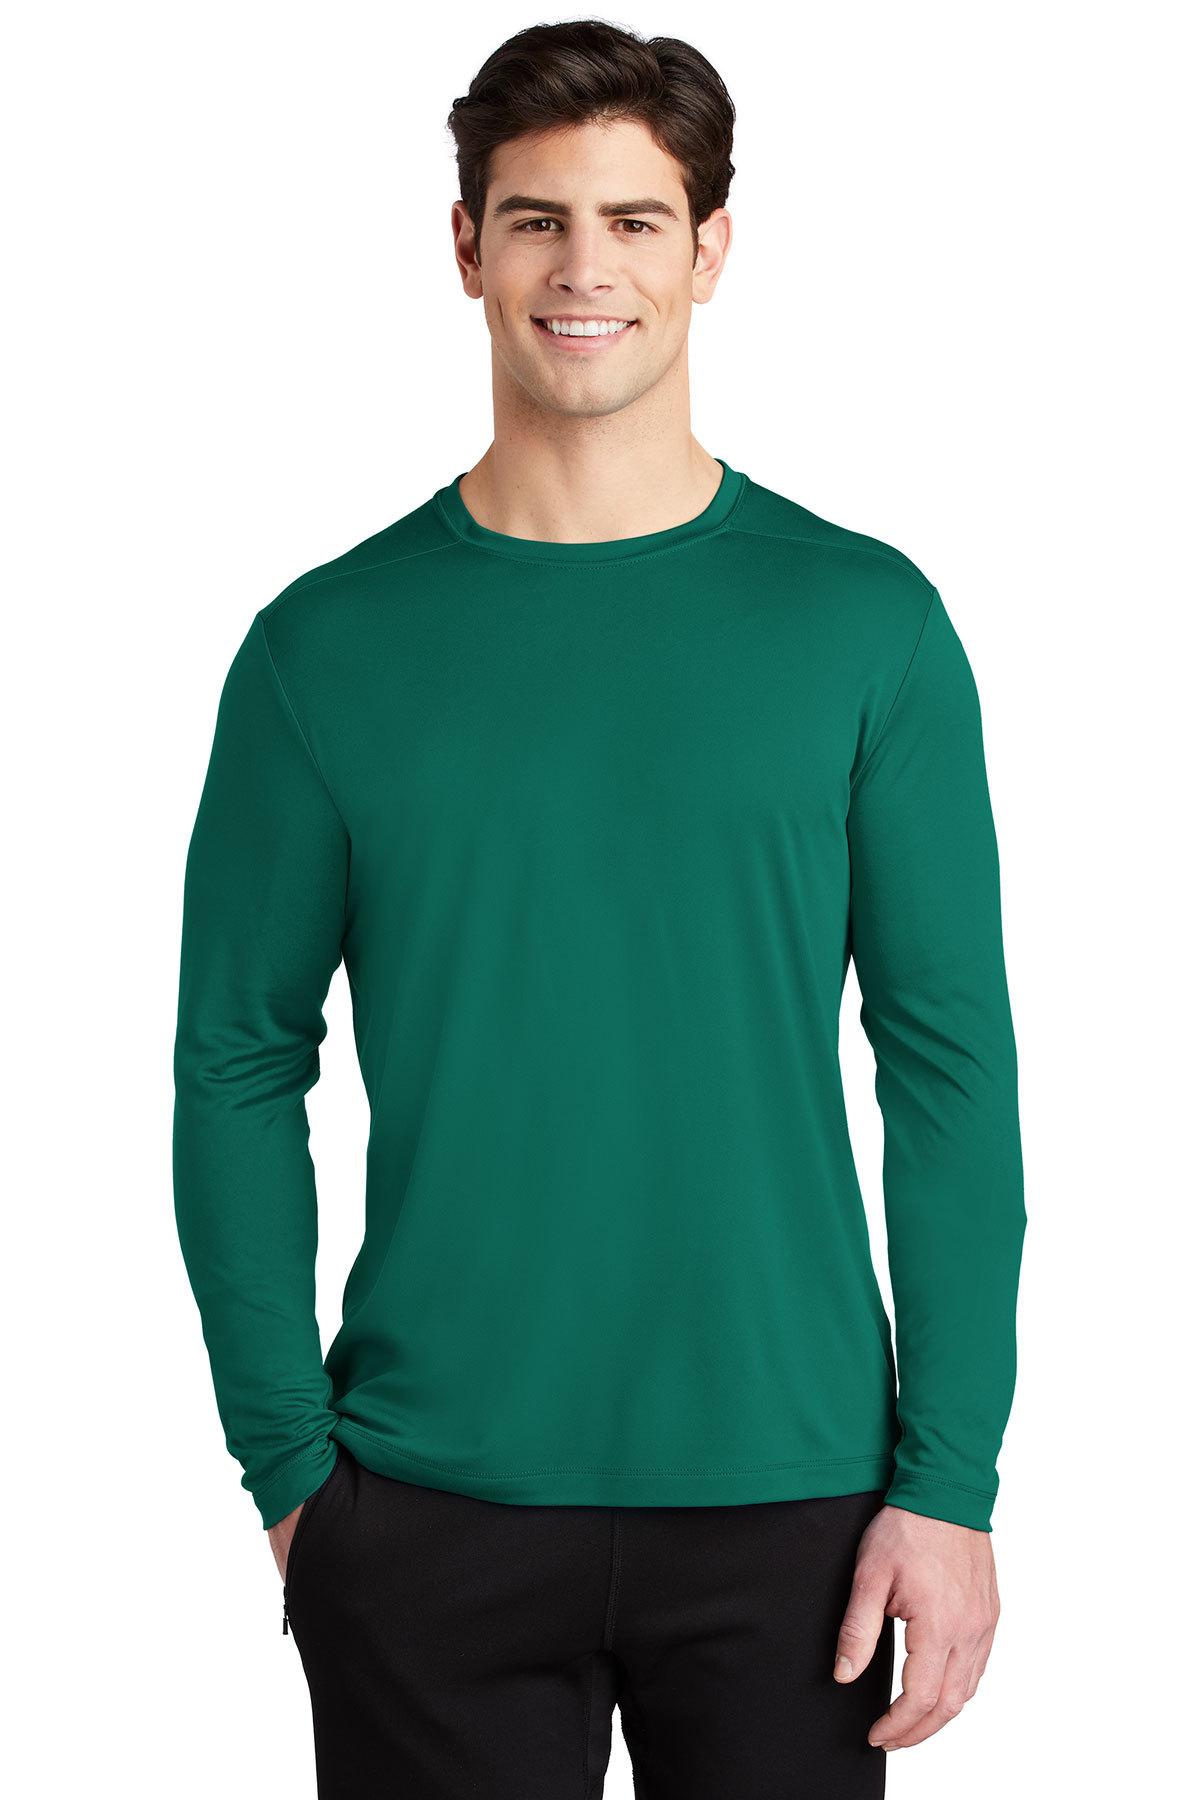 Sport Tek St420ls Posi Uv Pro Long Sleeve Tee 8 08 T Shirts Unfollow sportek to stop getting updates on your ebay feed. sport tek st420ls posi uv pro long sleeve tee 8 08 t shirts